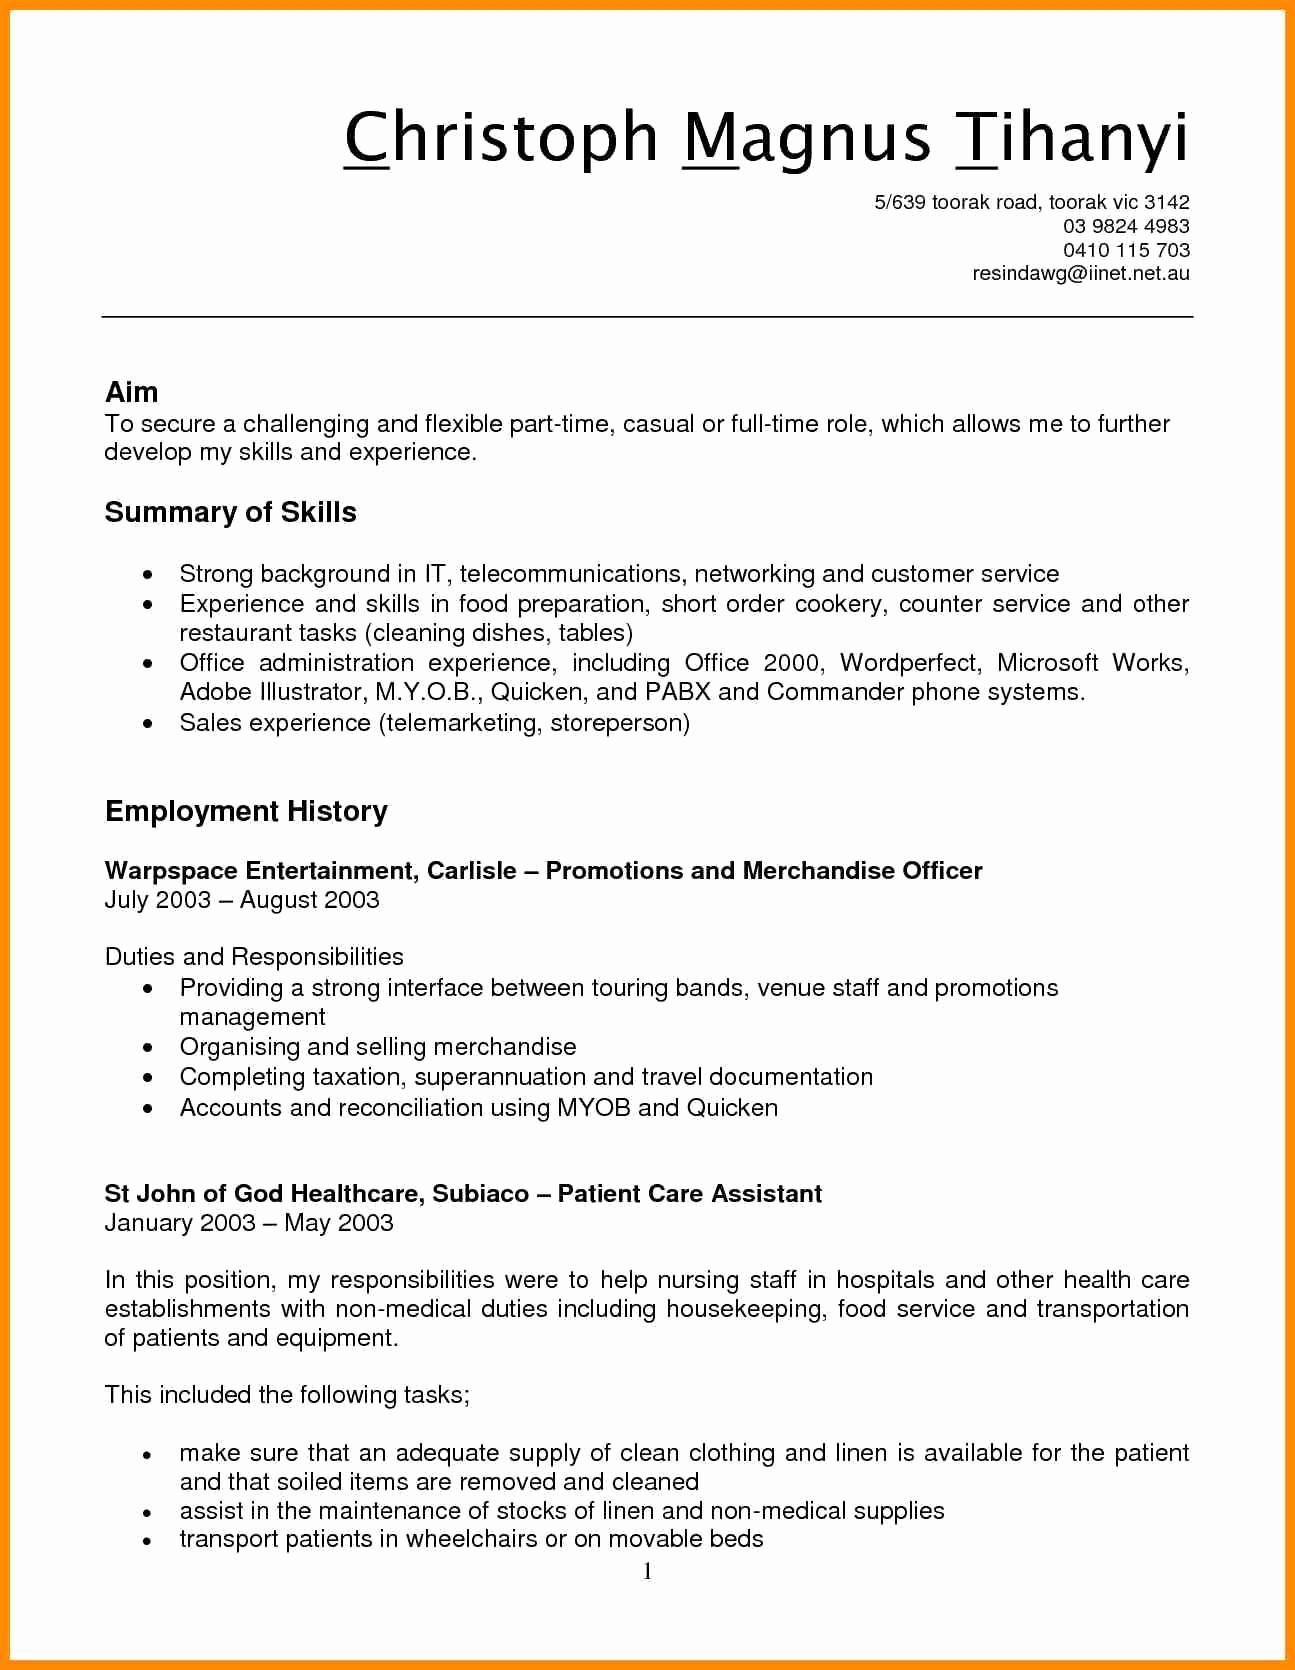 Sample Resume for Medical Office assistant with No Experience 12 13 Medical Office assistant Resumes Samples